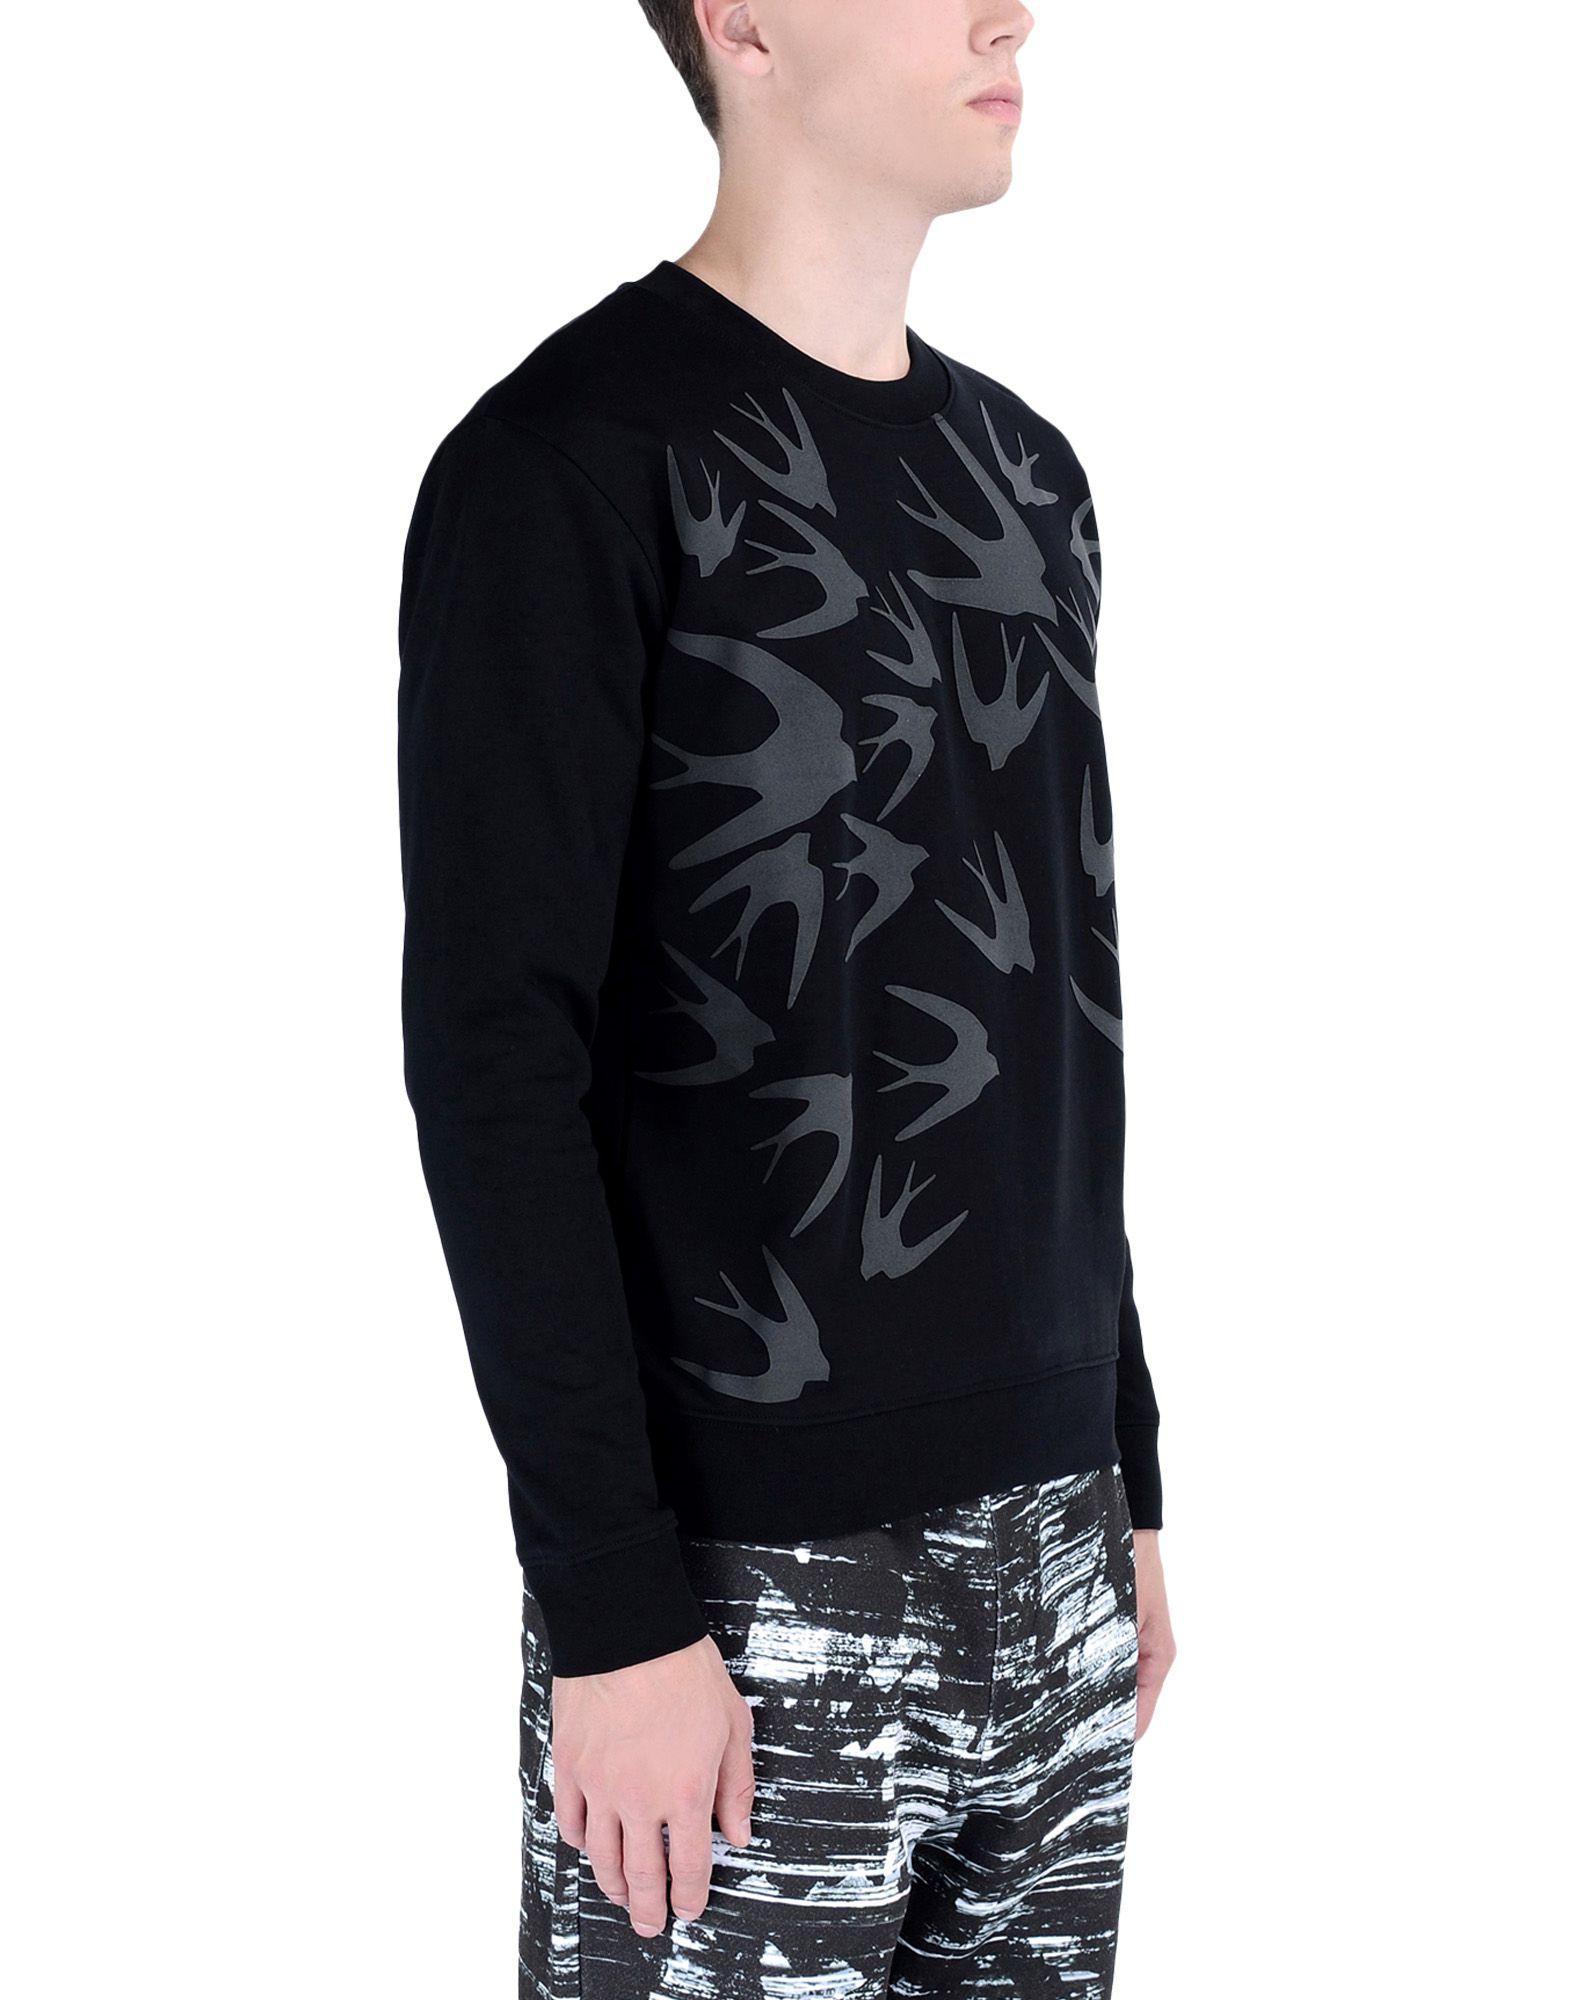 mcq alexander mcqueen sweatshirt in black for men lyst. Black Bedroom Furniture Sets. Home Design Ideas